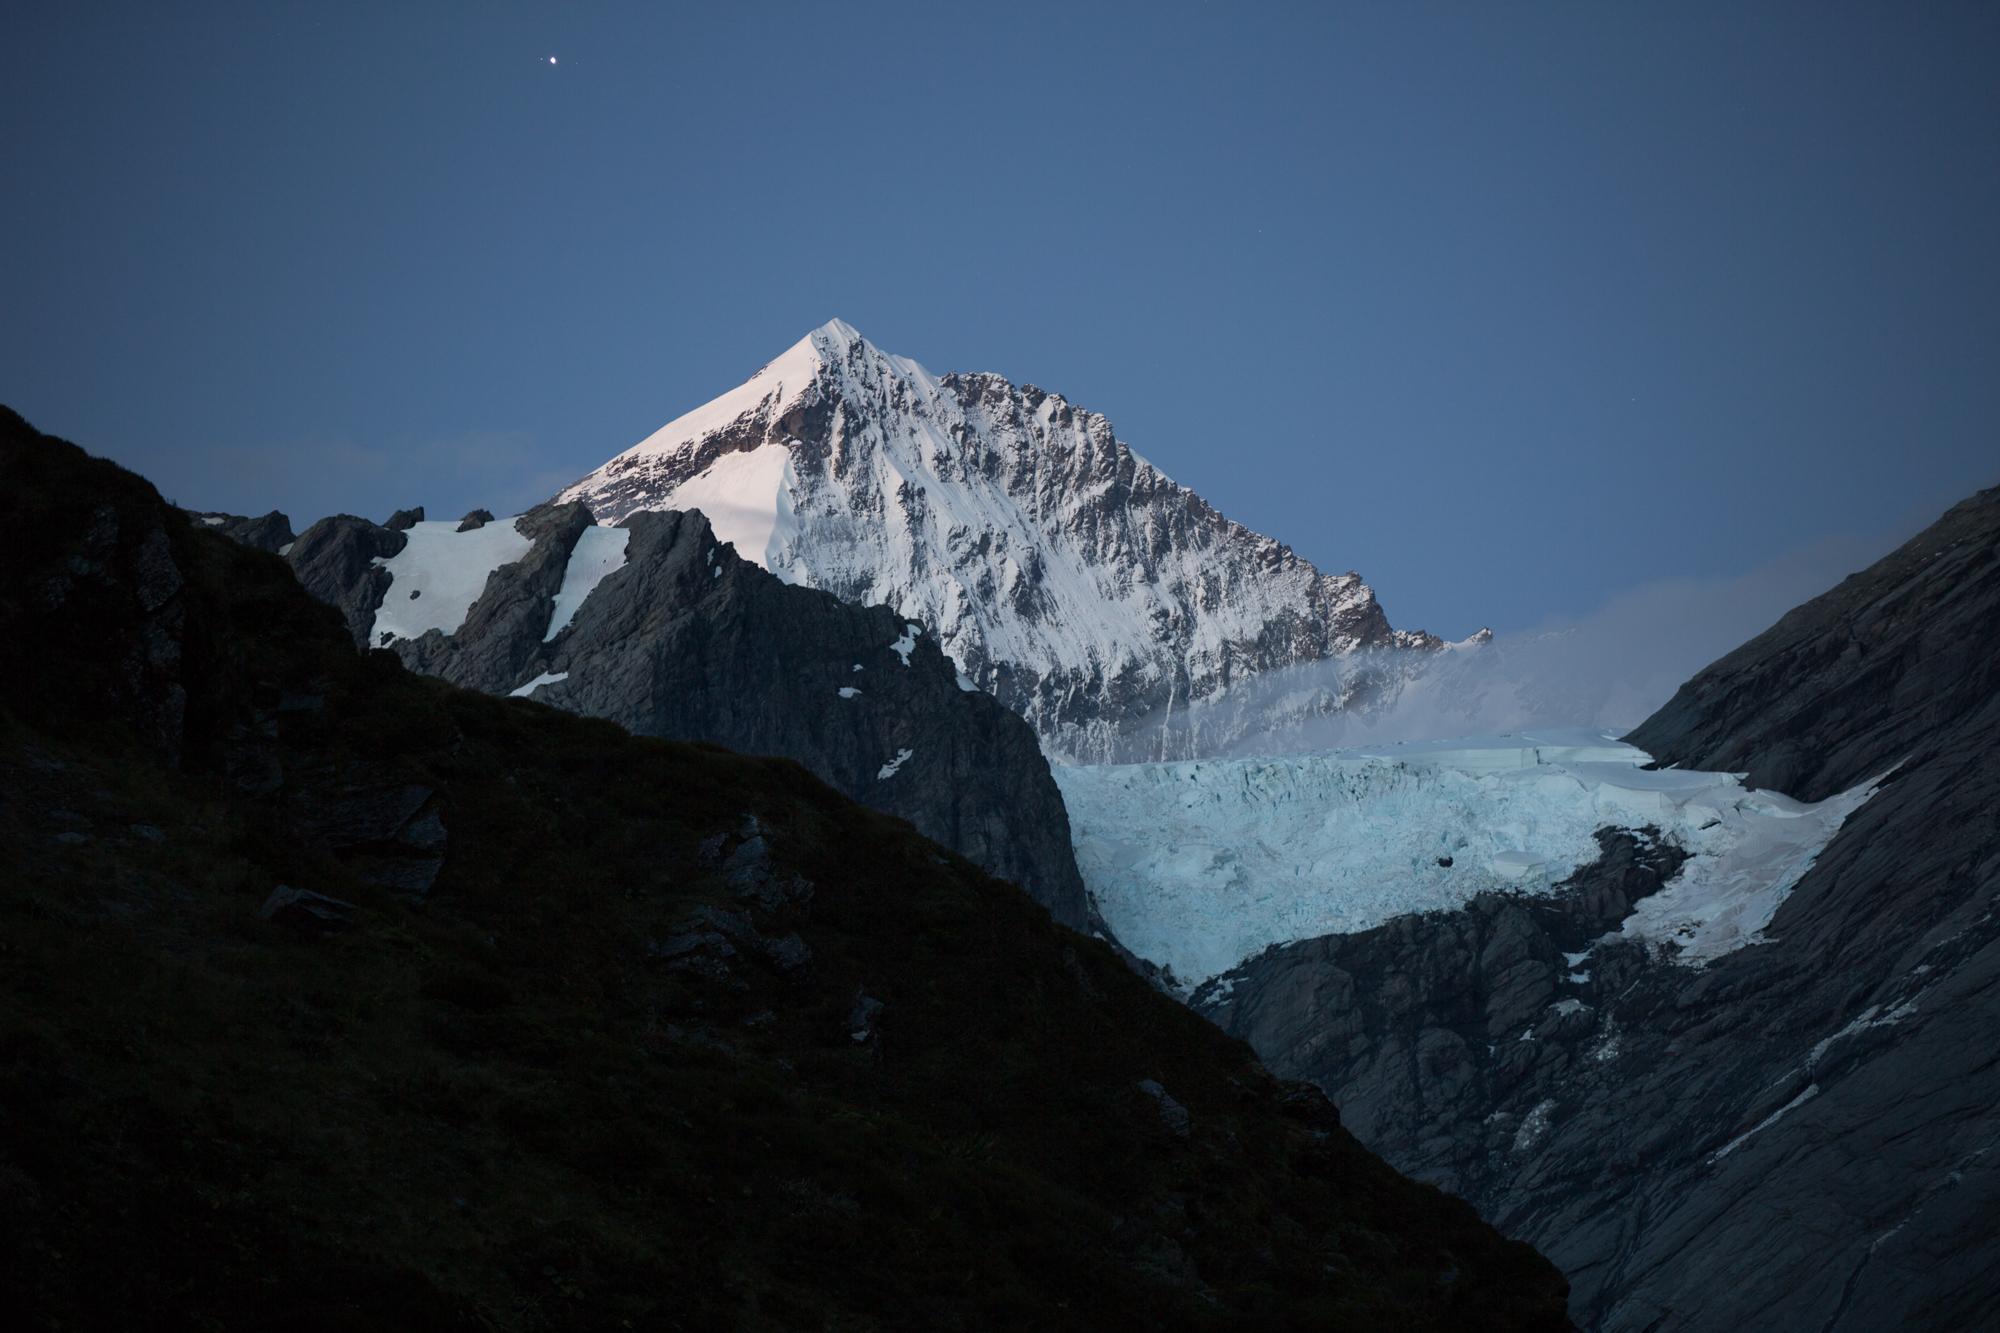 19-Bec_Kilpatrick_Photography_New_ZealandATP_2998